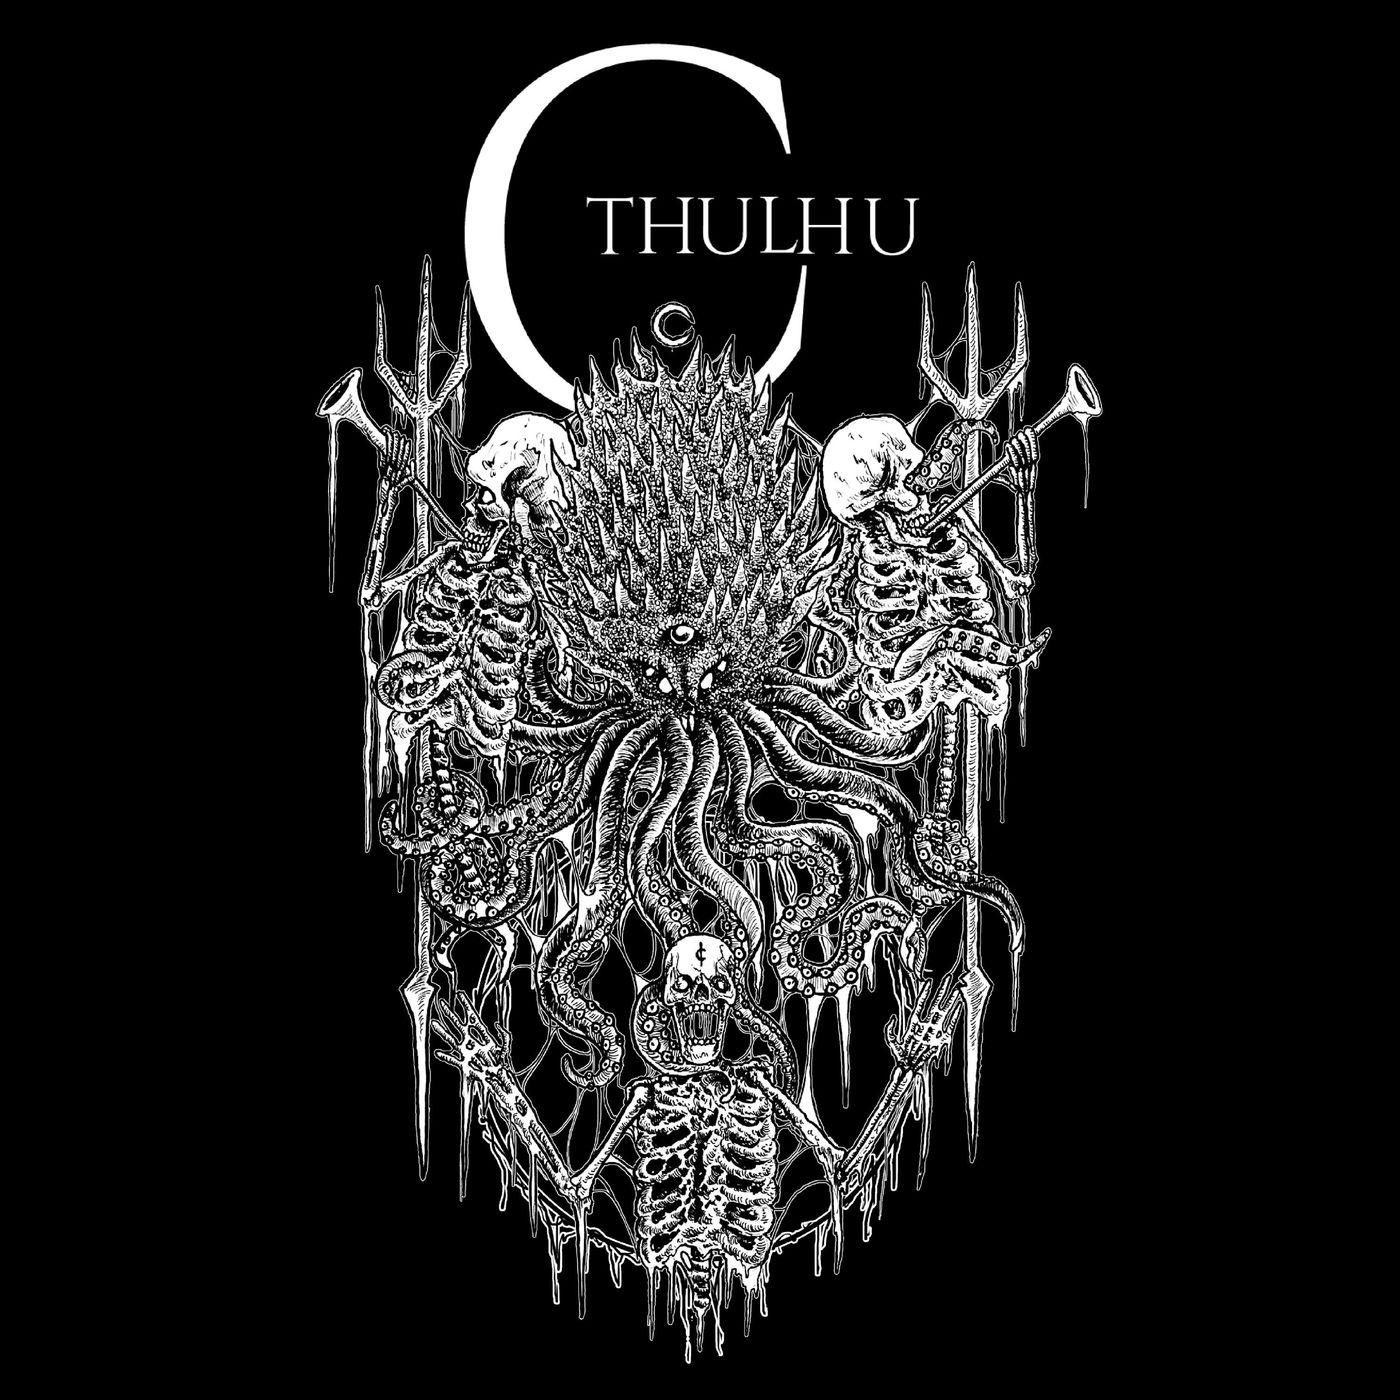 Cthulhu - Cthulhu [EP] (2020)